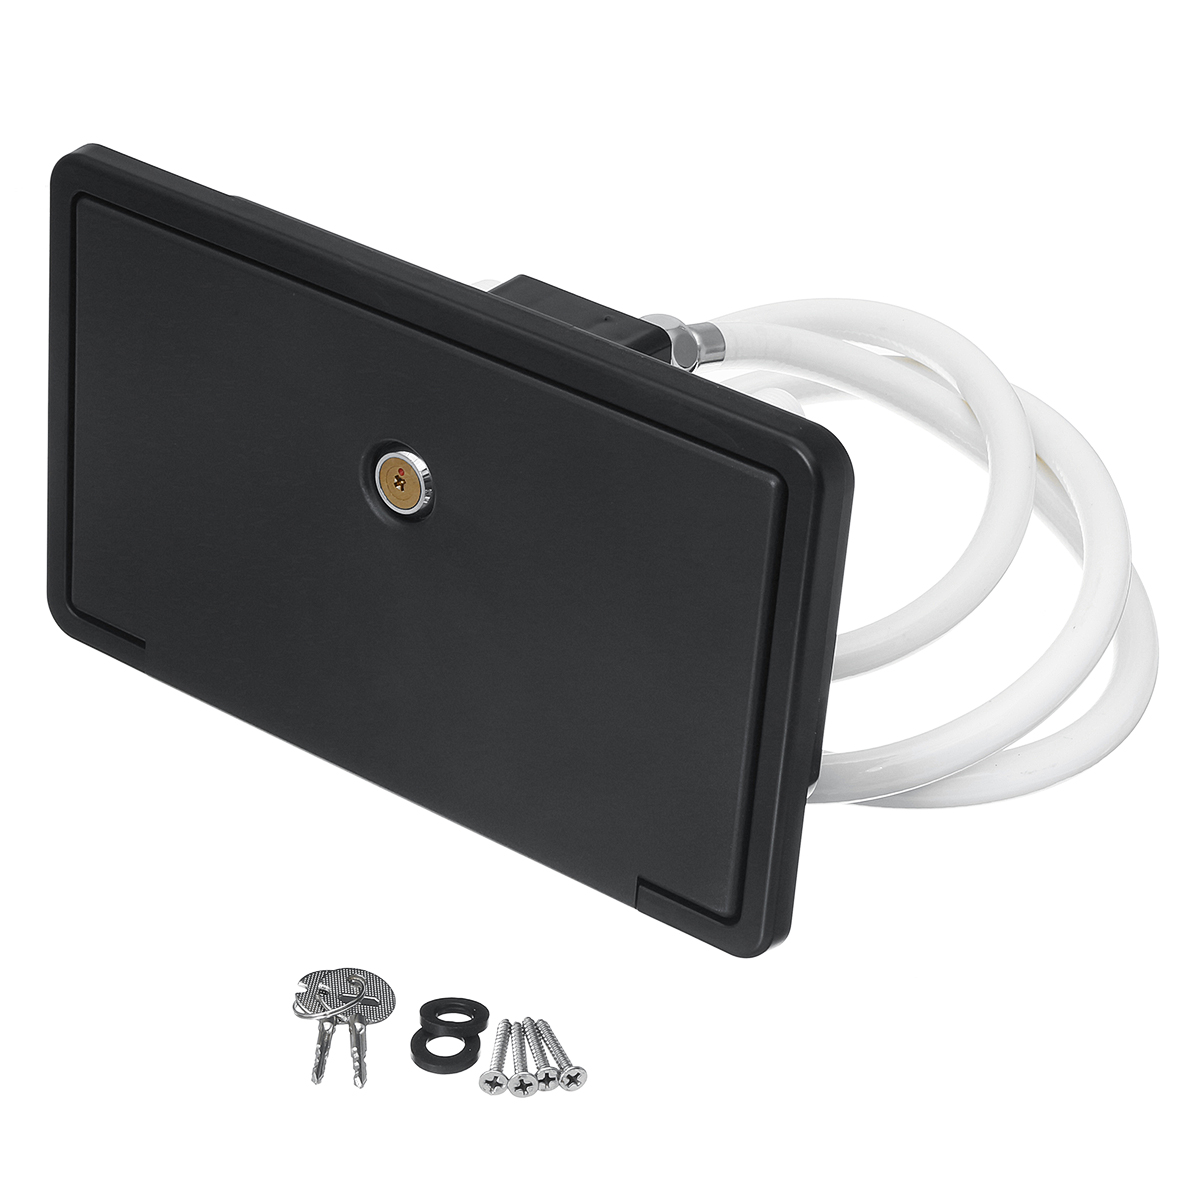 Xueqin Portable RV Exterior Shower Box Kit Shower Faucet Lock ...